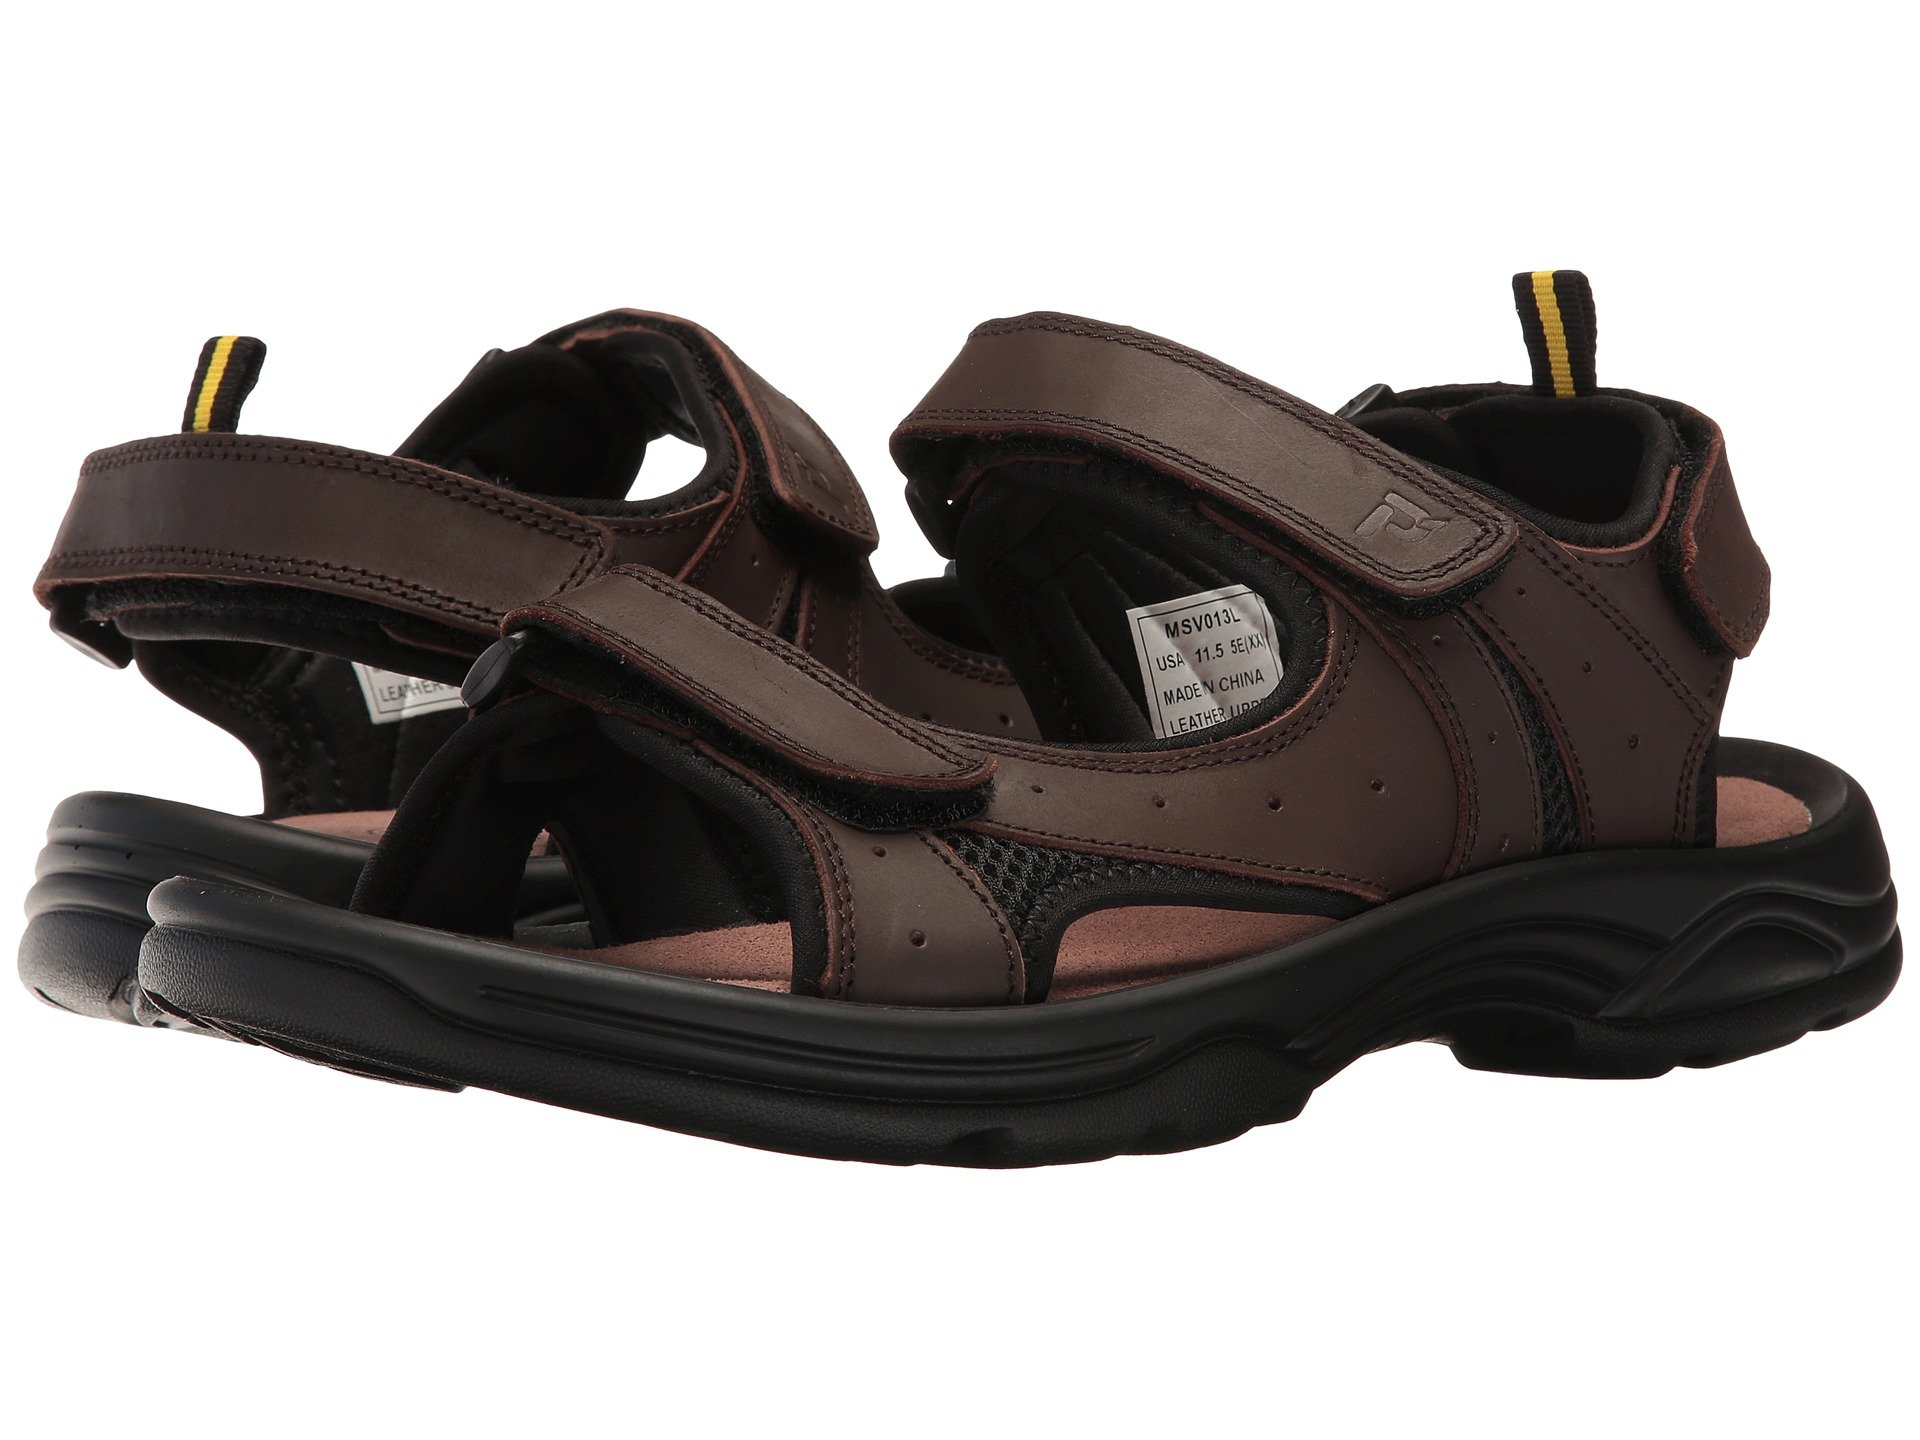 b825e03fc5 Men's Propet Shoes + FREE SHIPPING | Zappos.com